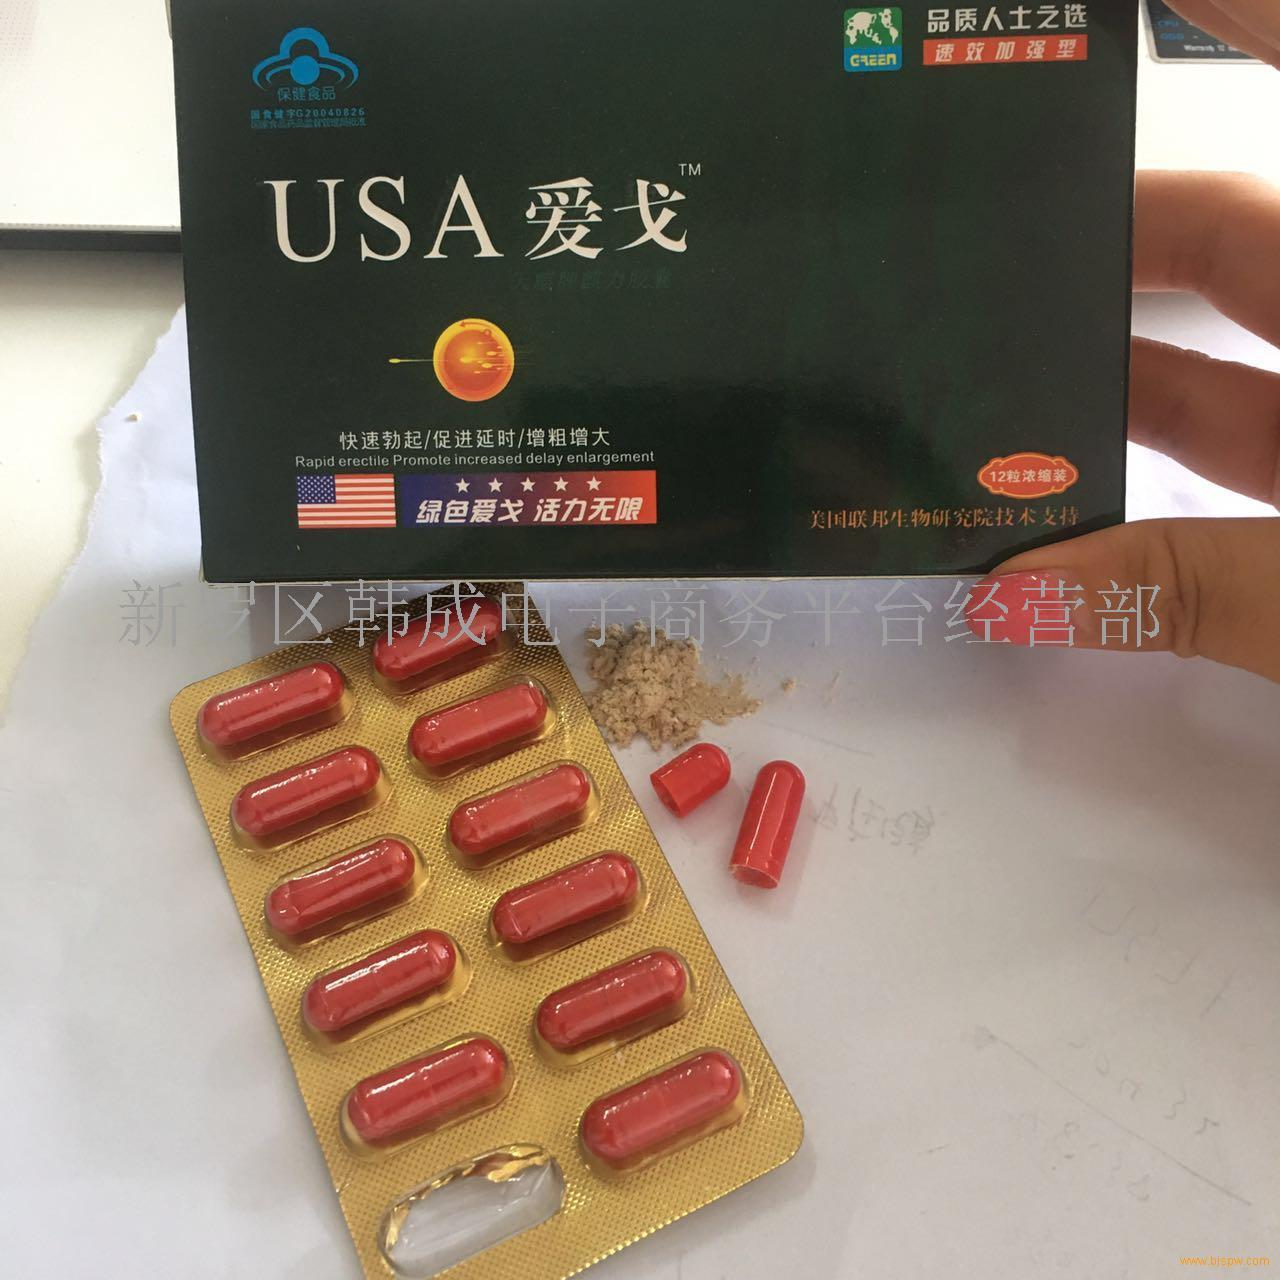 USA爱戈胶囊招商